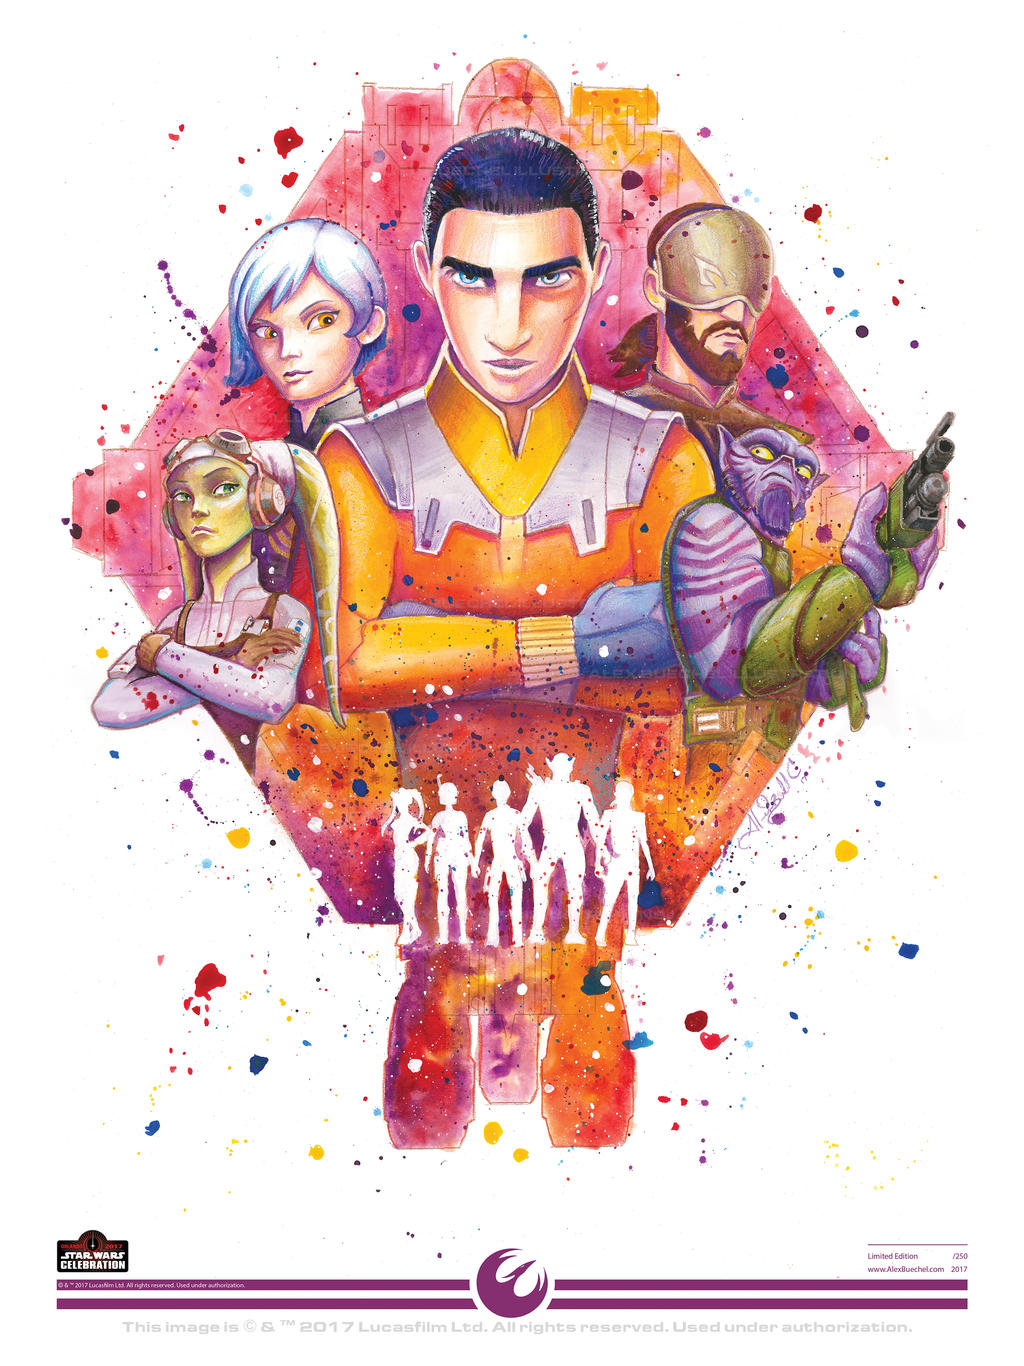 Ghost - Star Wars Celebration 2017 Art Print